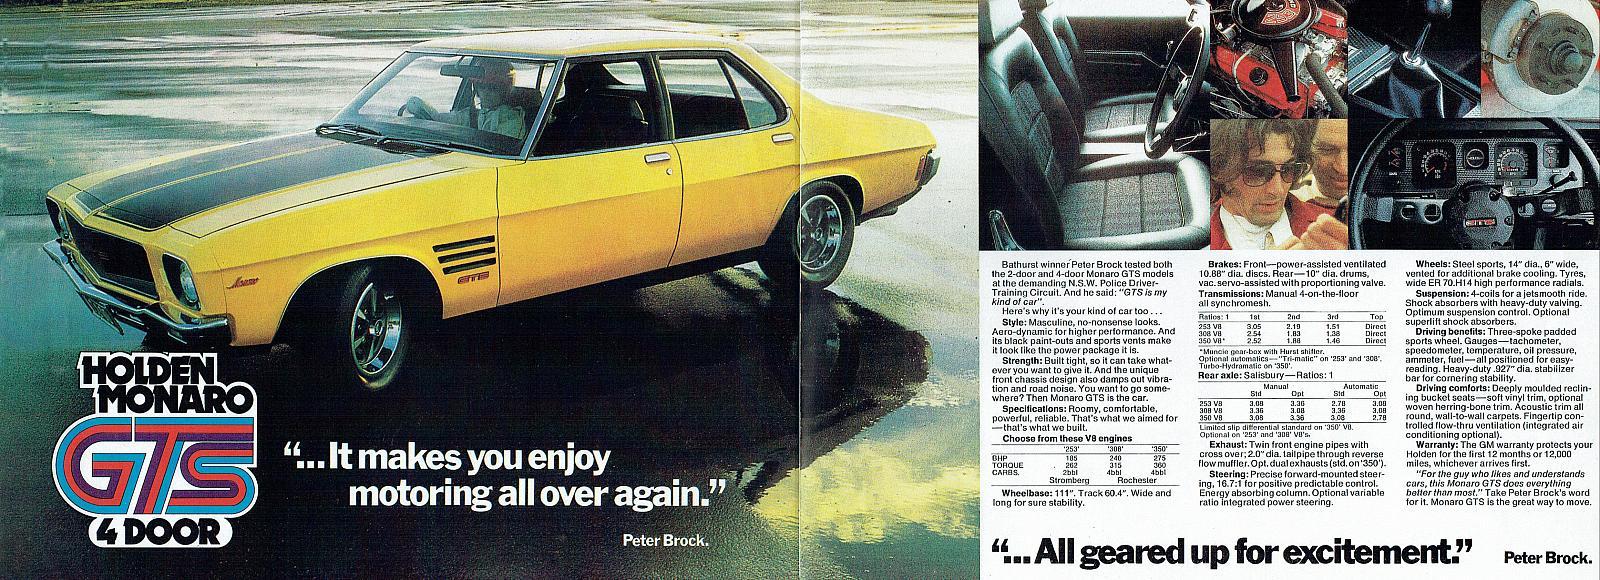 TunnelRam_1973 Holden HQ Monaro GTS-02-03.jpg